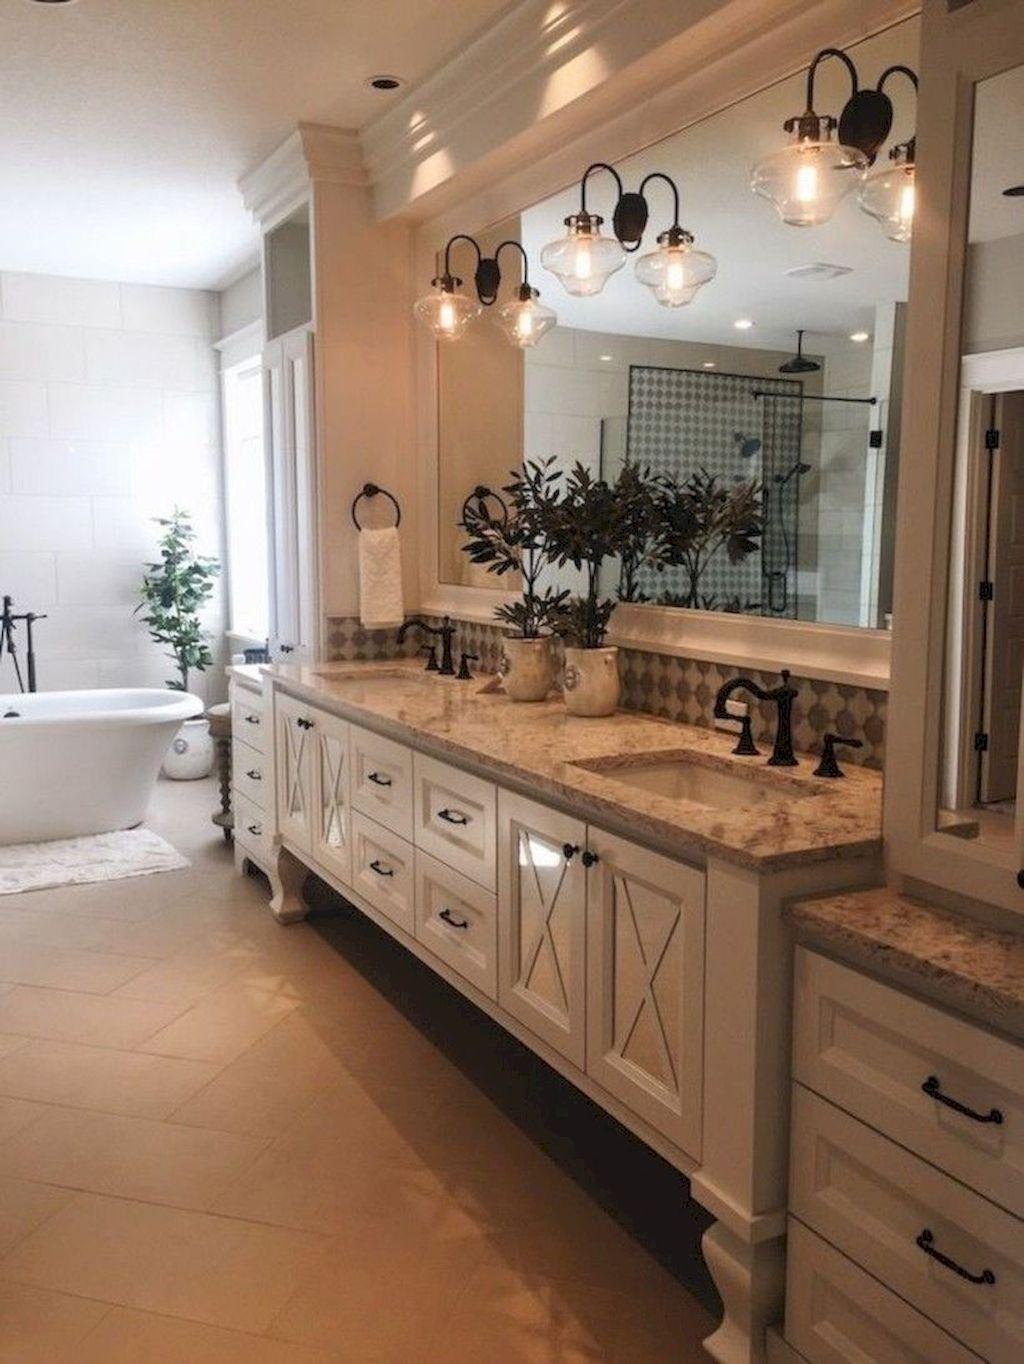 Relax Rustic Farmhouse Bathroom Design Ideas | Rustic ... on Farmhouse Modern Bathroom Ideas  id=25340